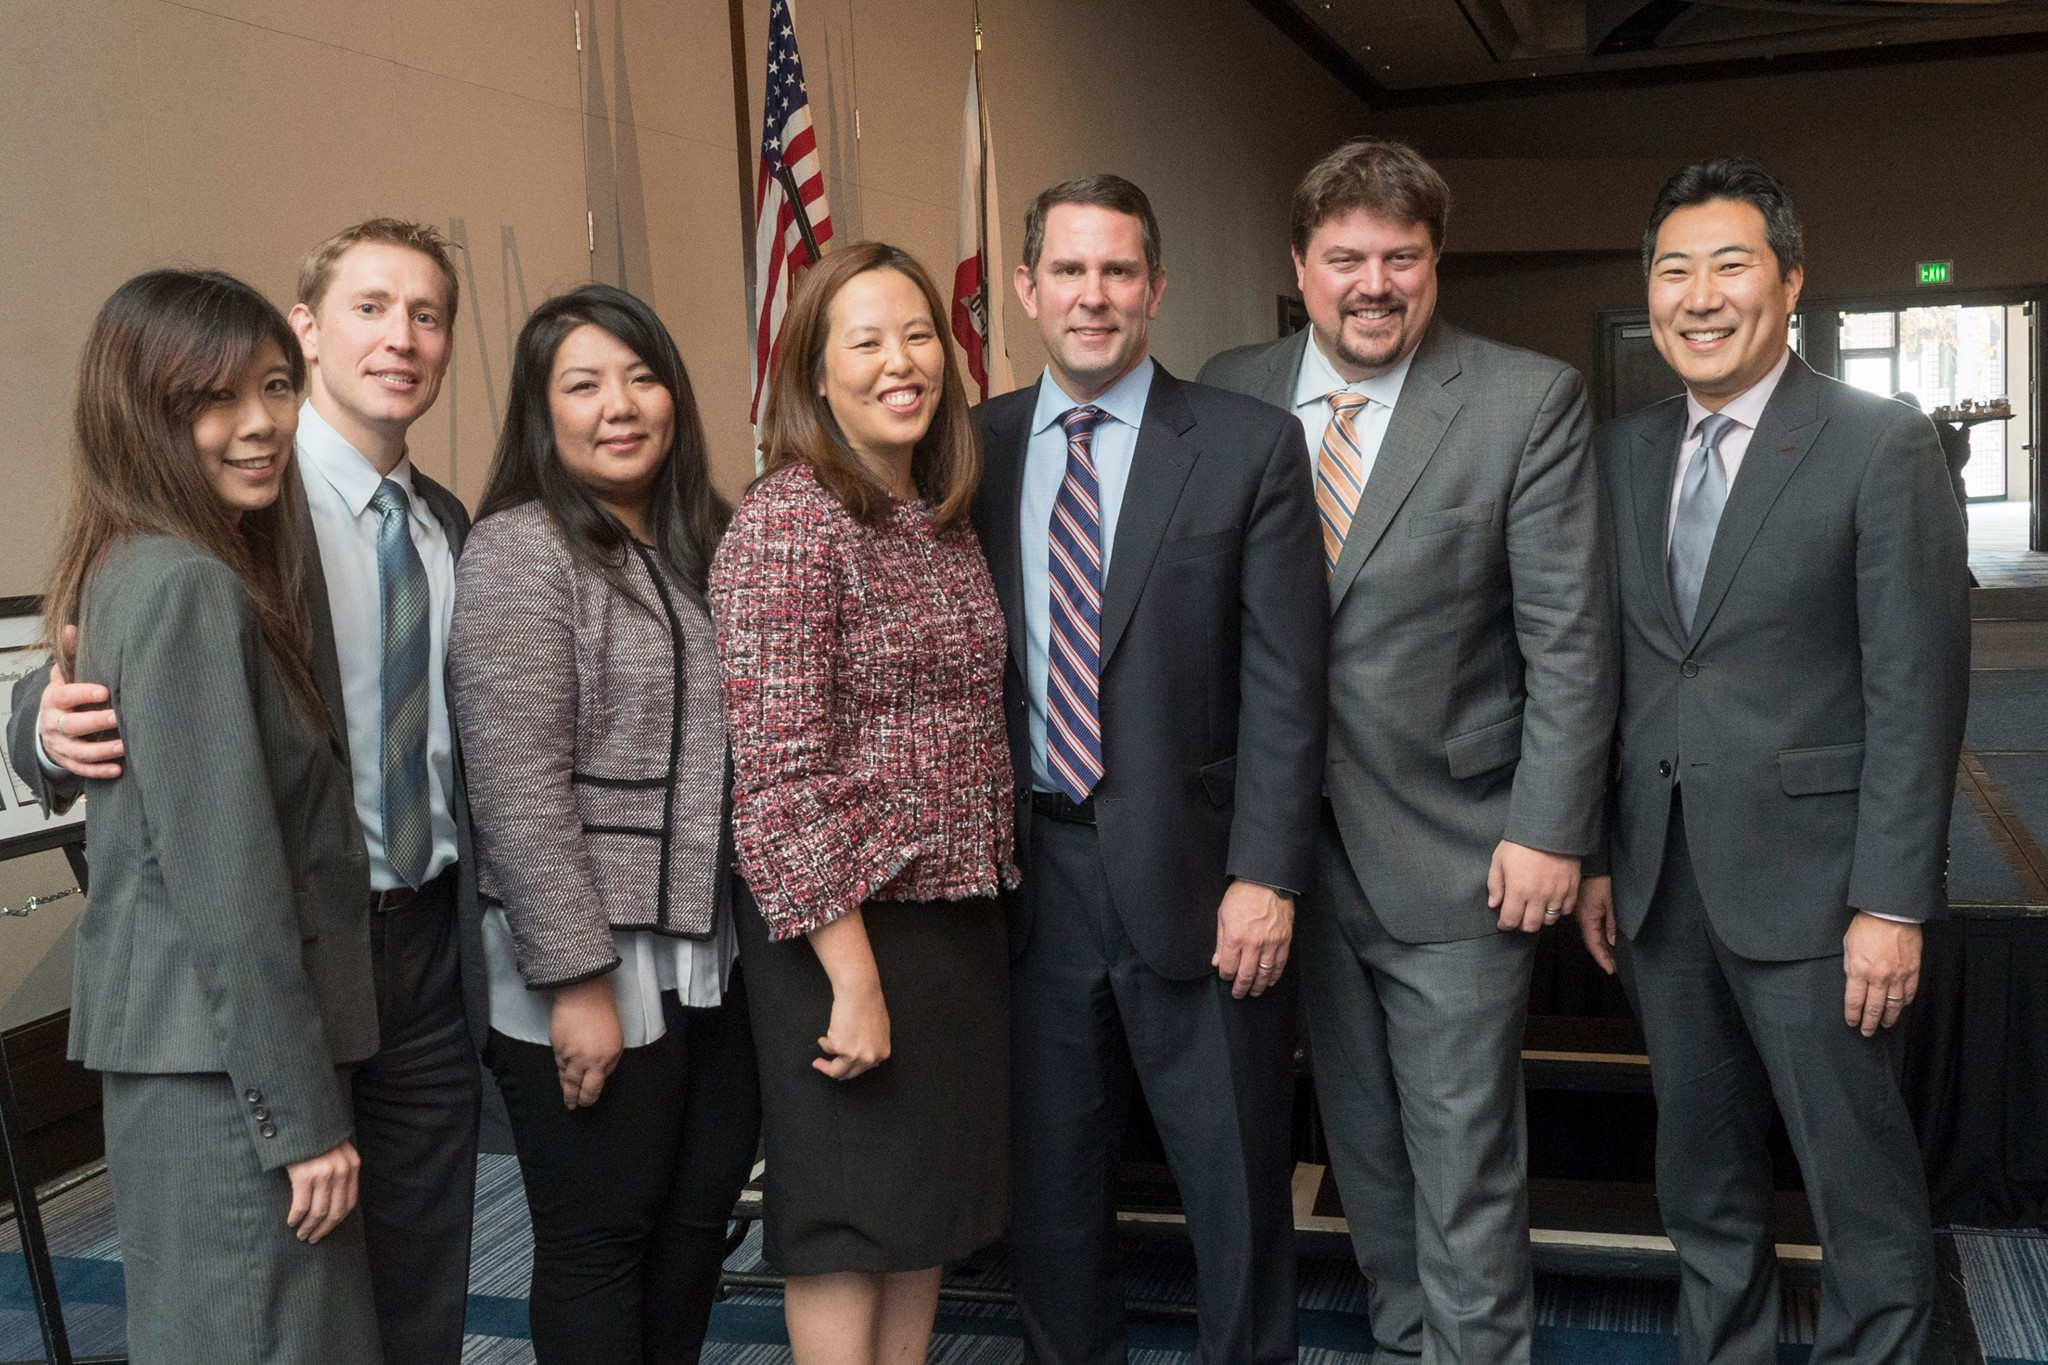 Lisa P. Mak Joins Board of The Bar Association of San Francisco